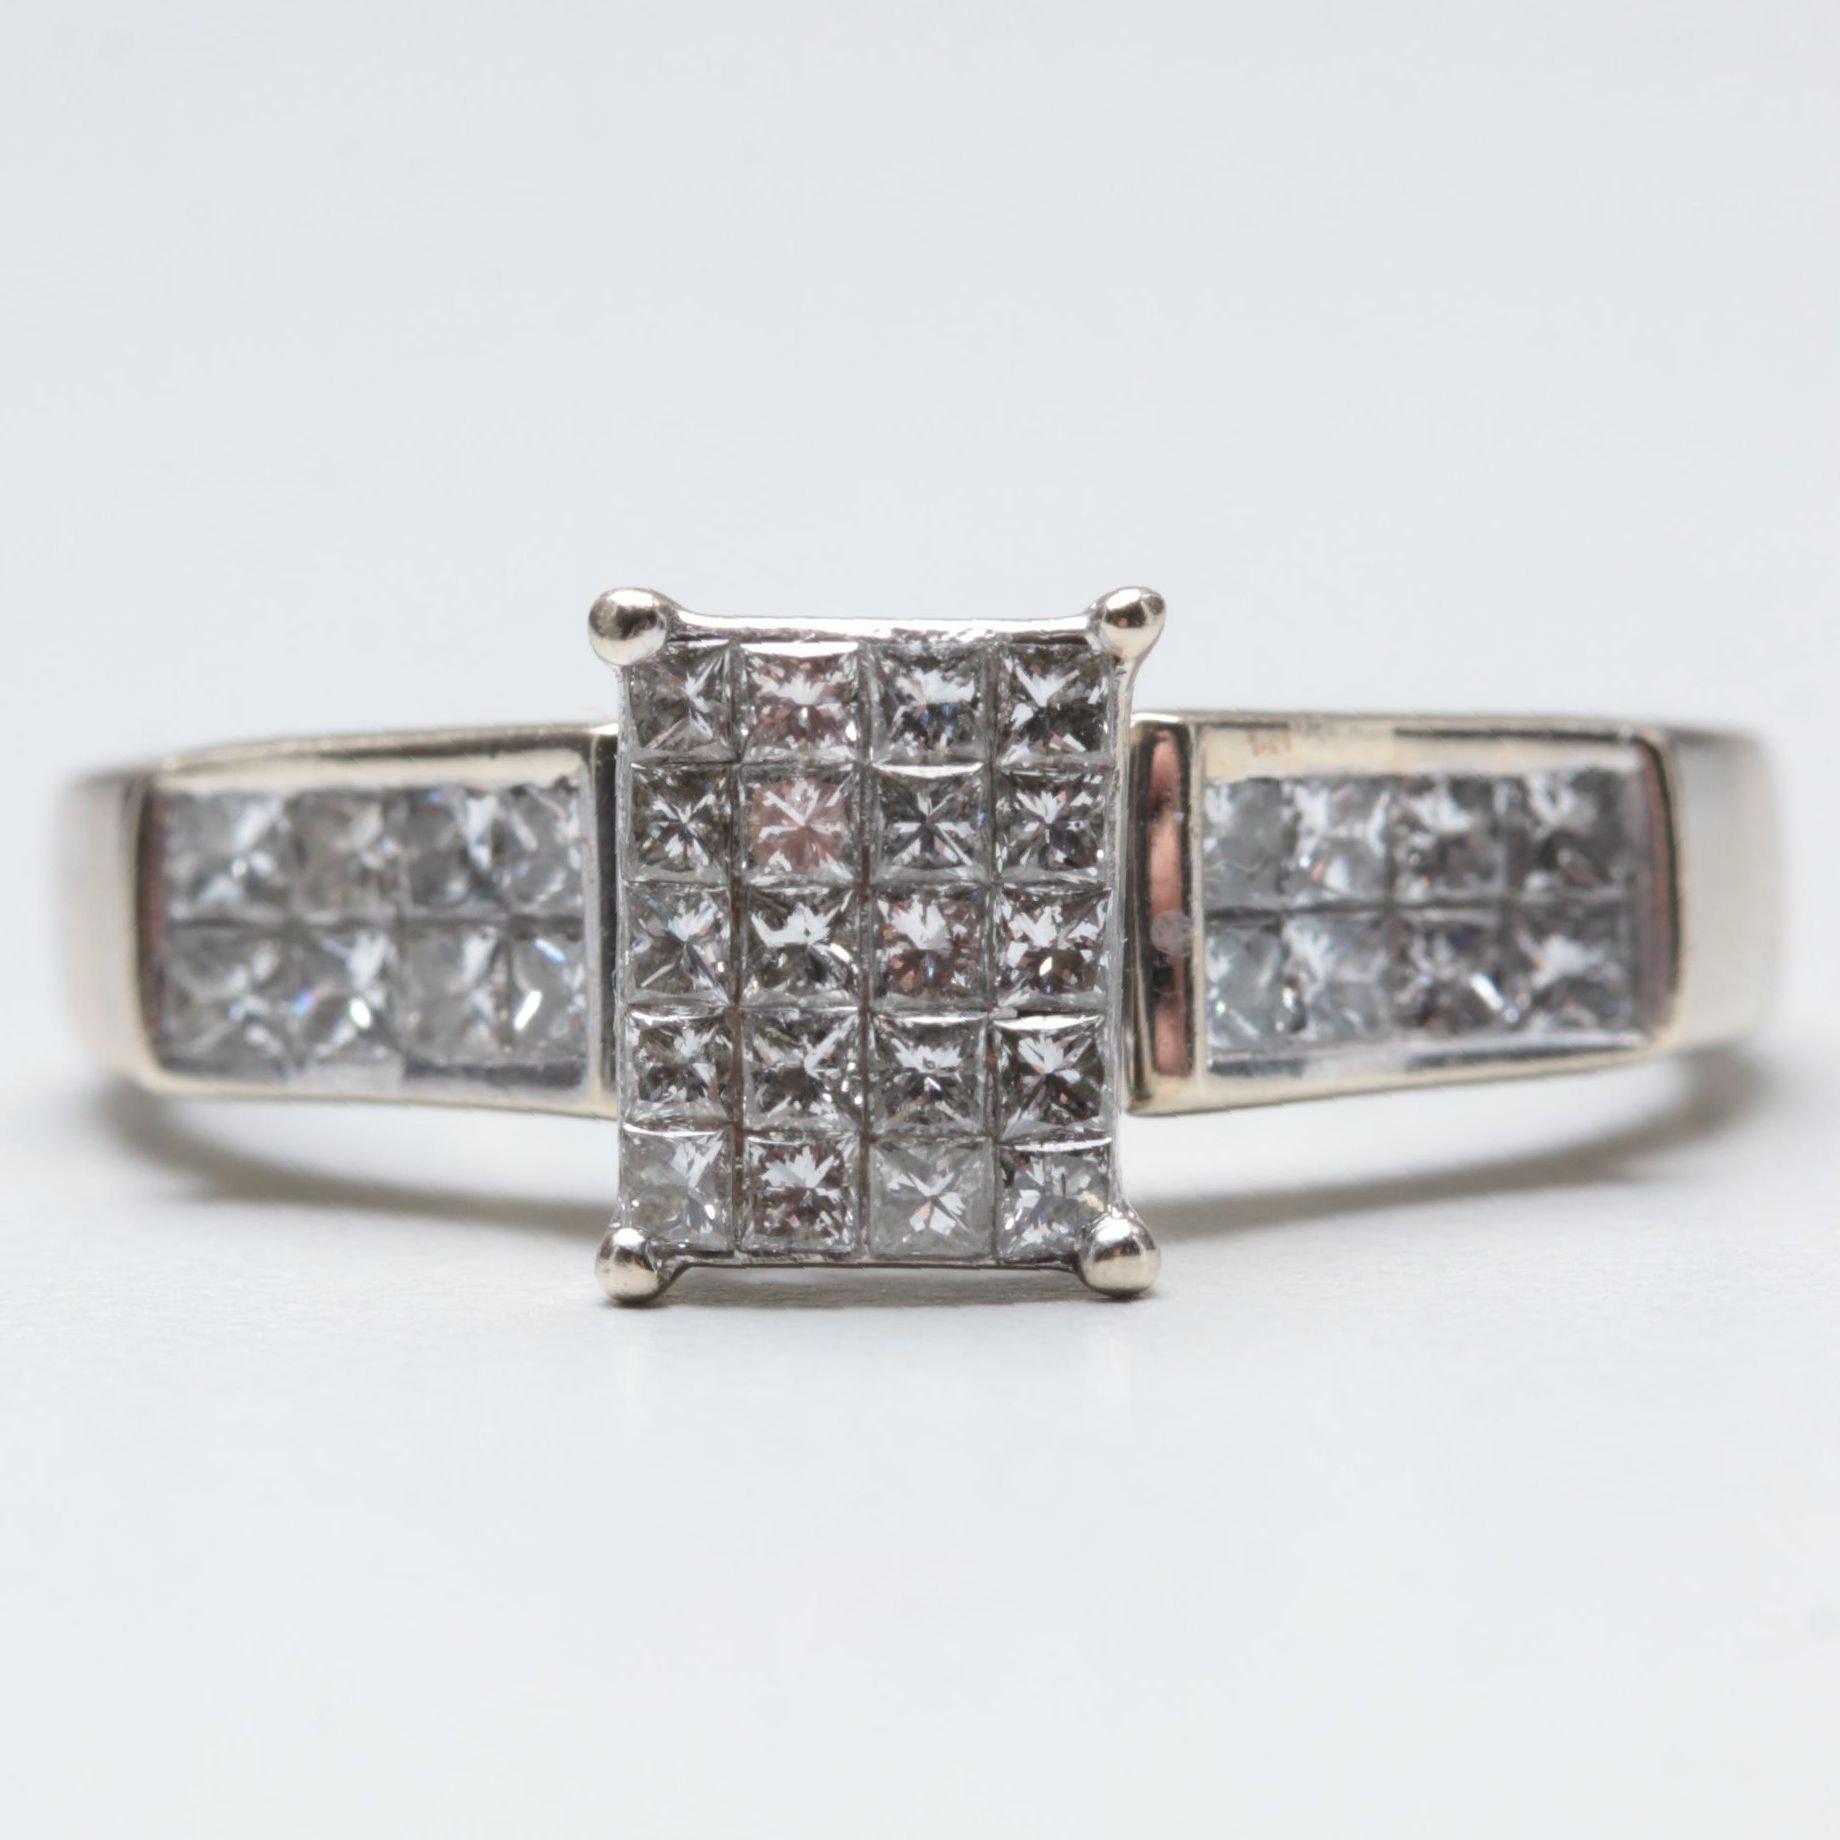 14K White Gold 1.24 CTW Diamond Ring